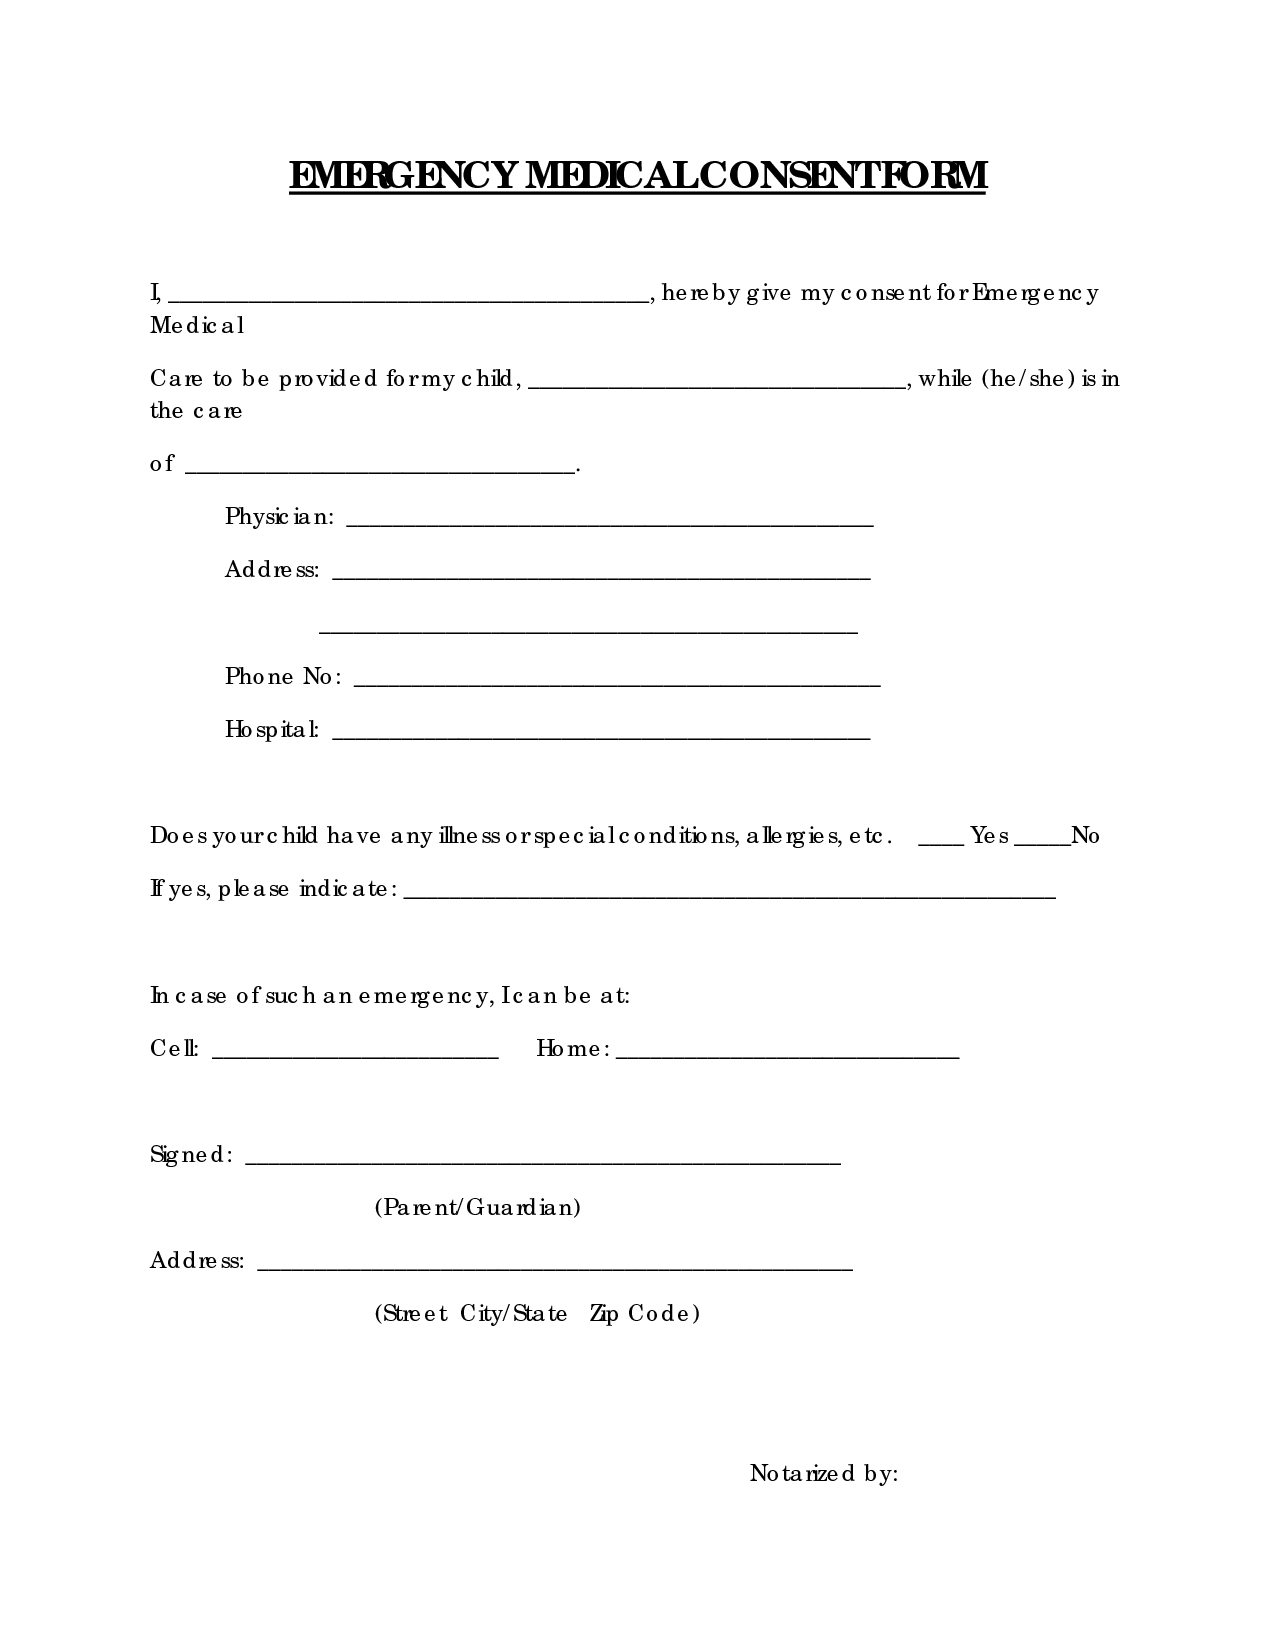 Free Printable Medical Consent Form   Emergency Medical Consent Form - Free Printable Medical Forms Kit